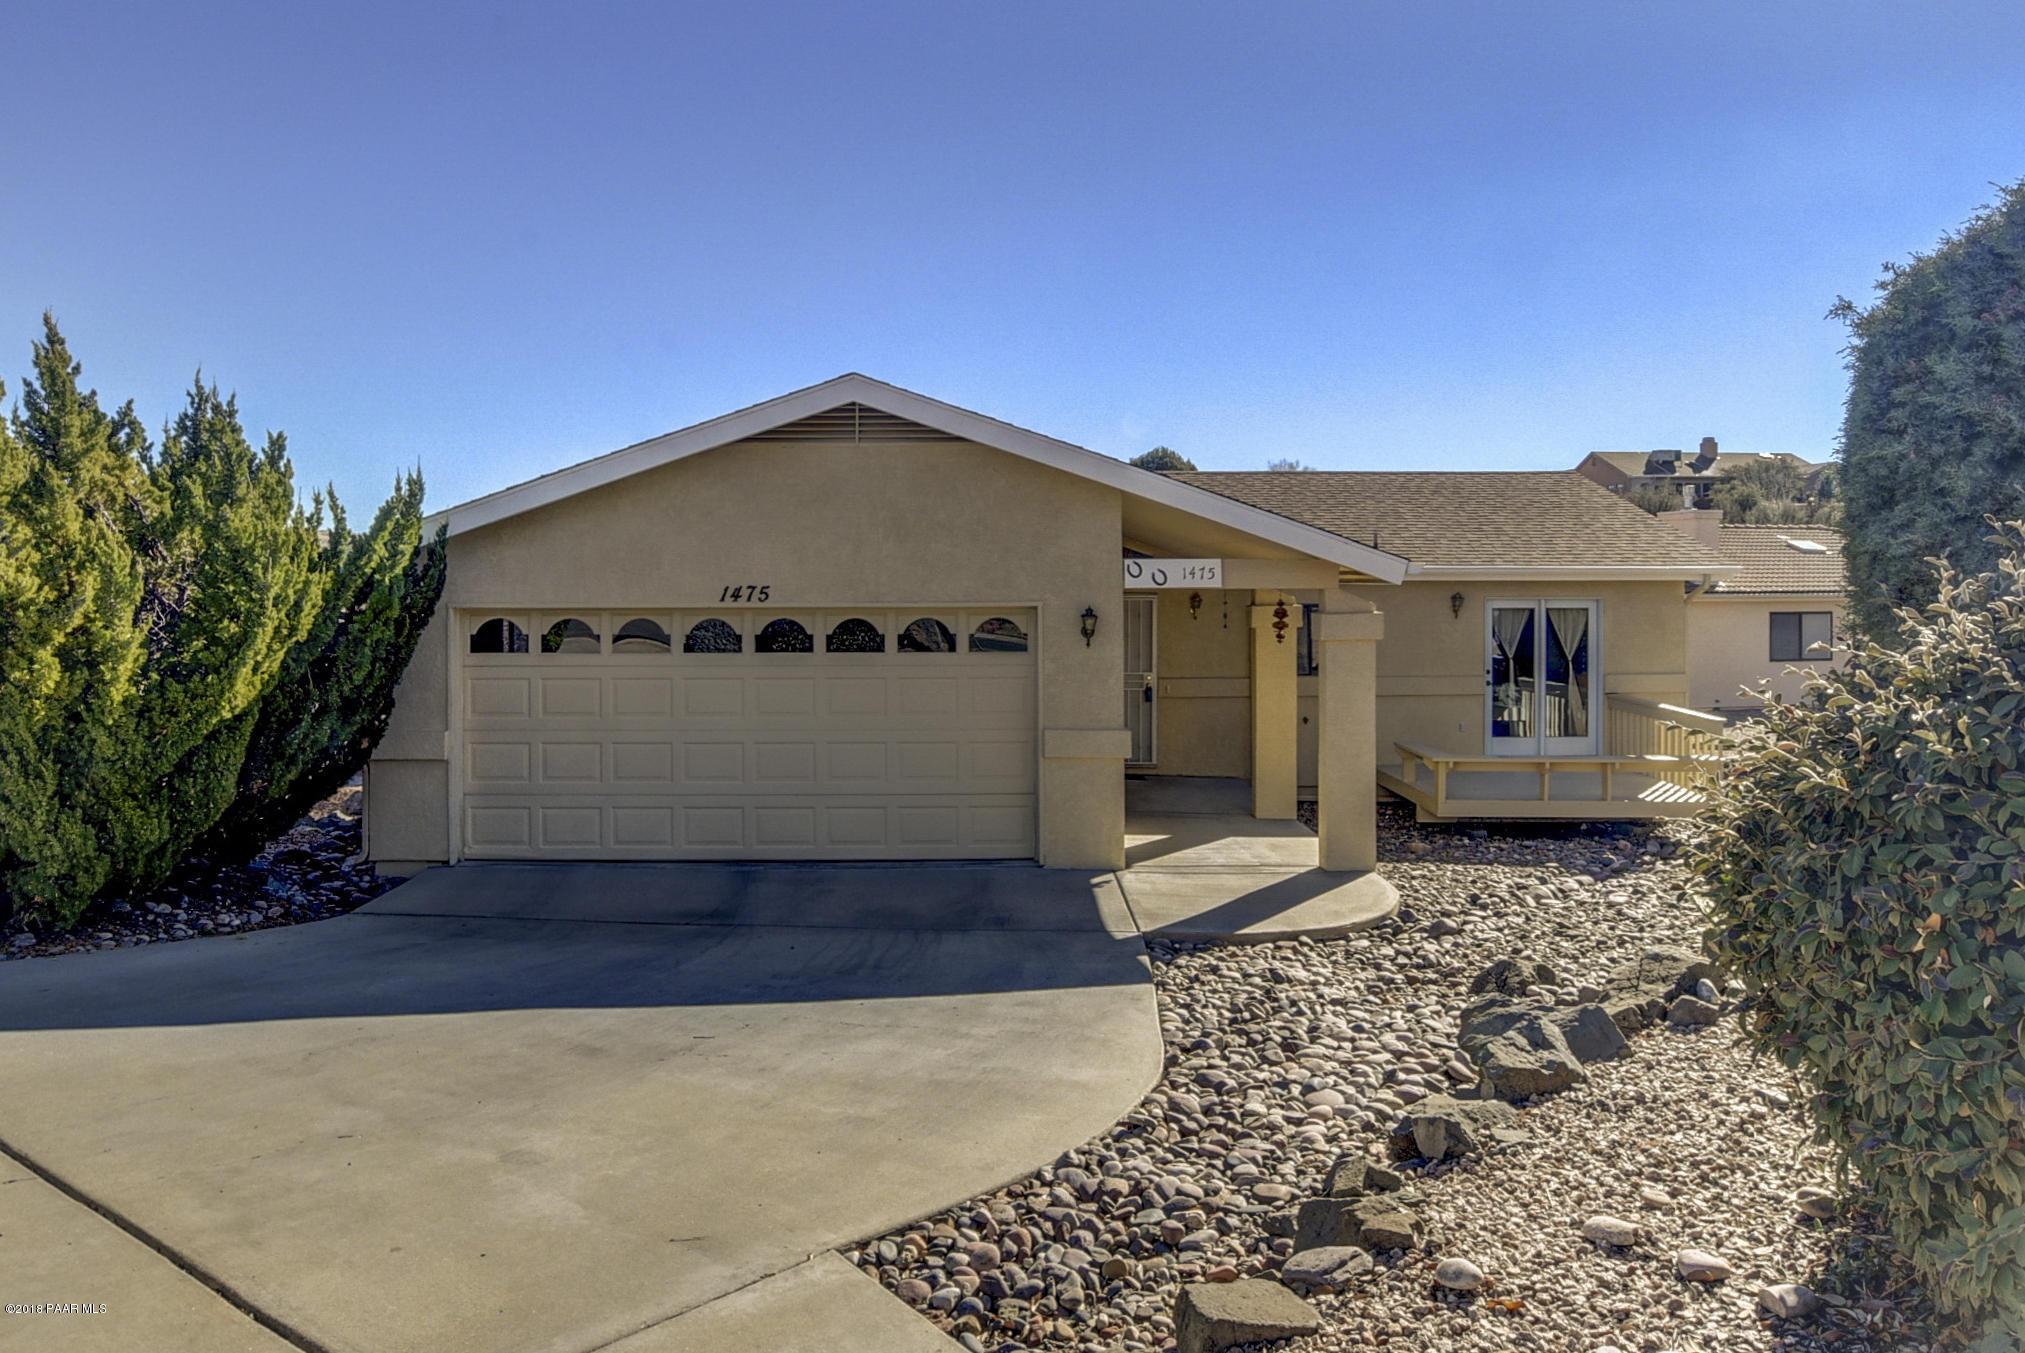 Photo of 1475 Marvin Gardens, Prescott, AZ 86301